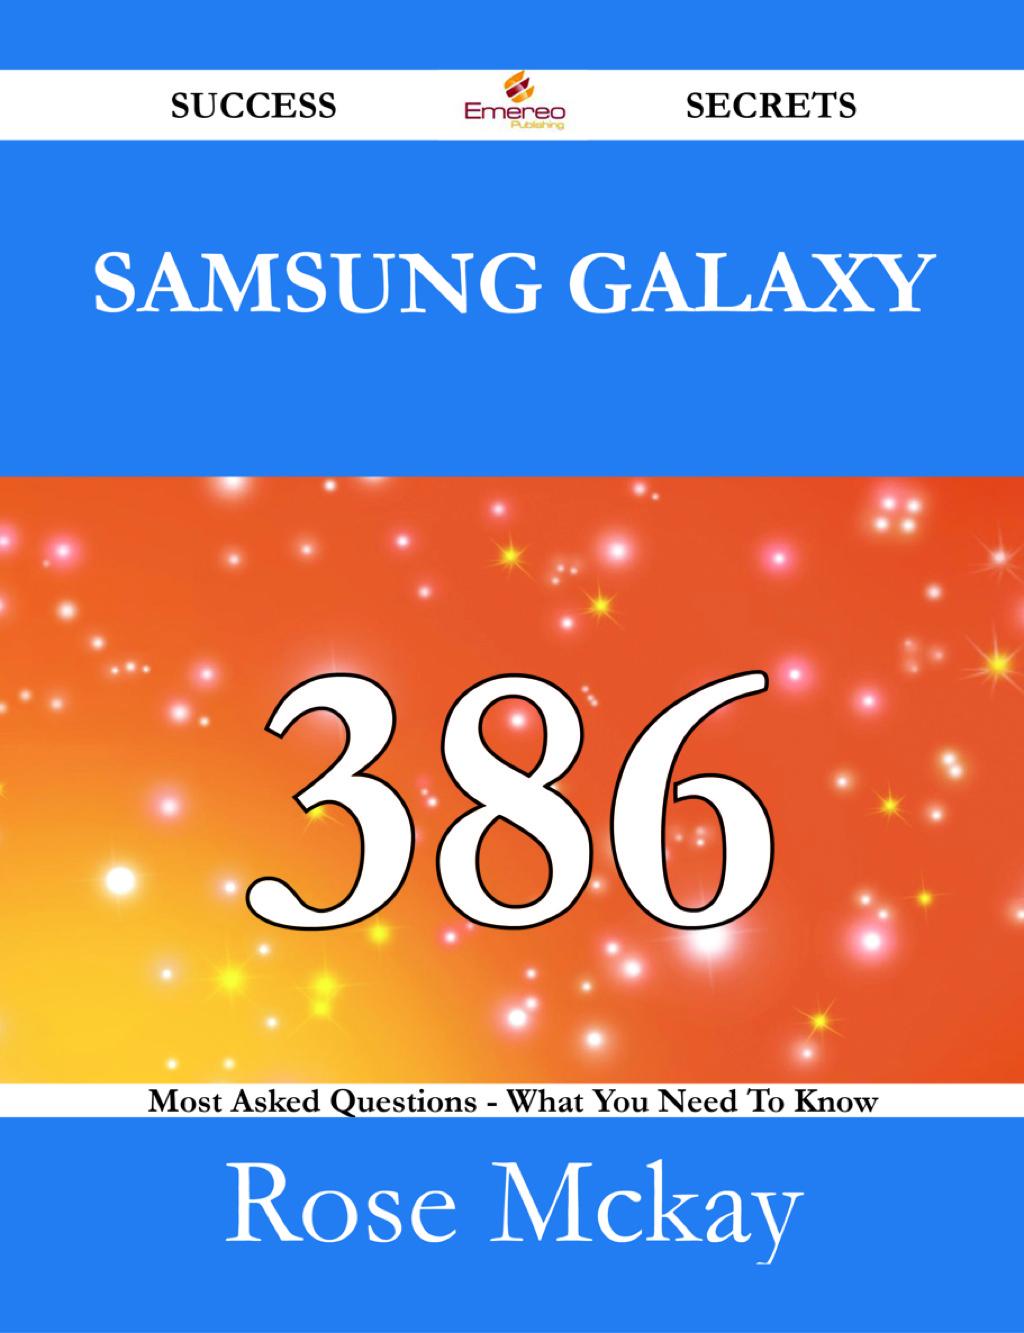 By Rose Mckay PRINTISBN: 9781488525117 E-TEXT ISBN: 9781488533365 Edition: 0